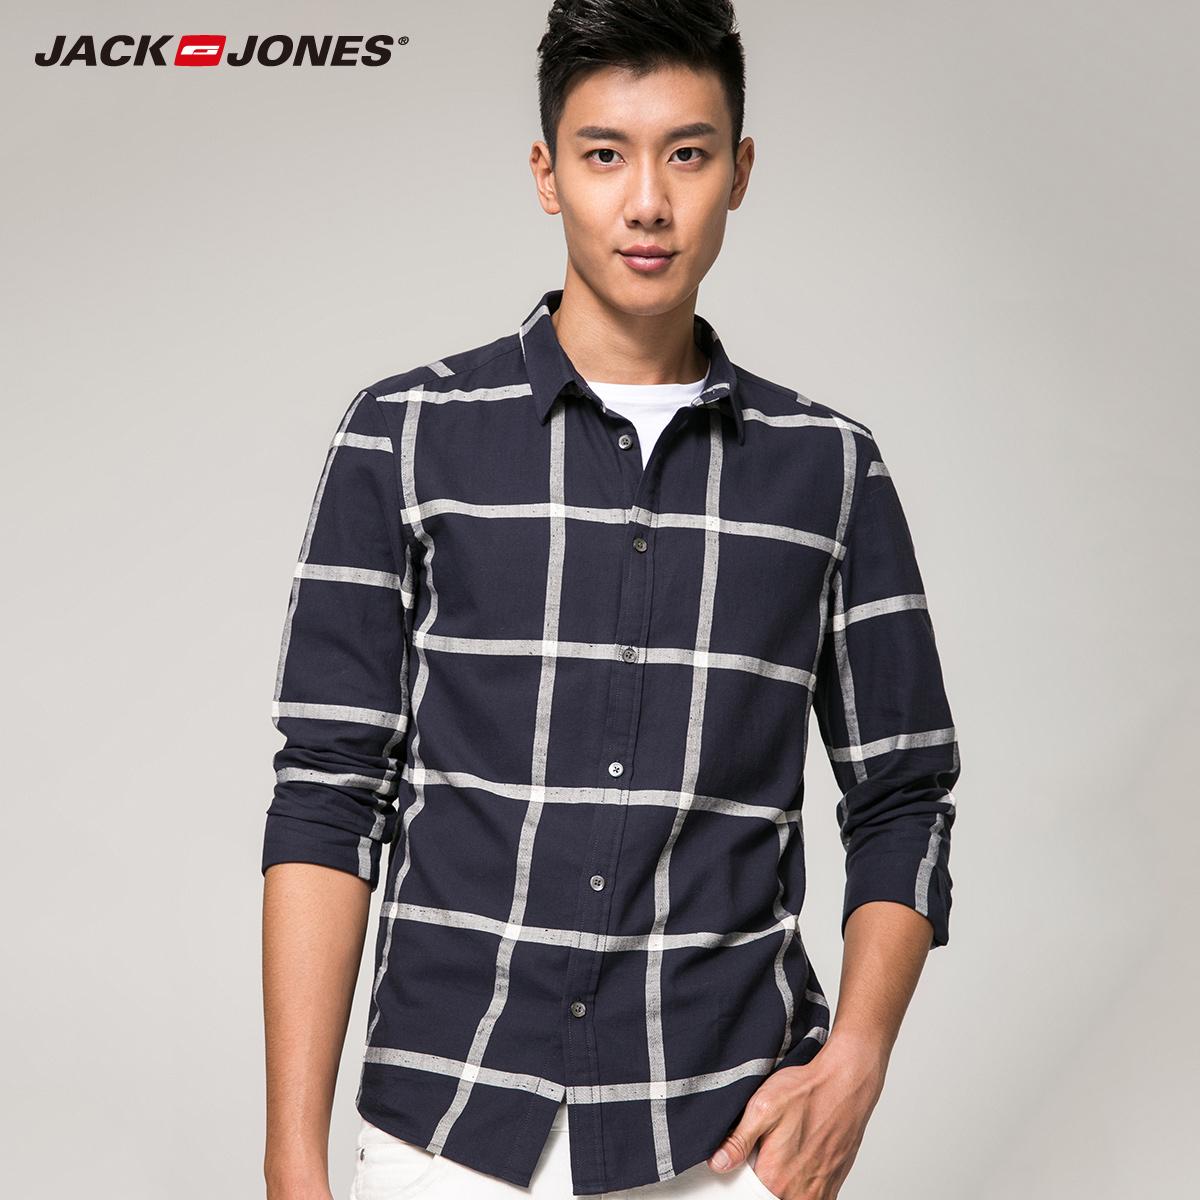 JackJones傑克瓊斯格紋純棉修身男裝 長袖襯衫衣E^|216405519